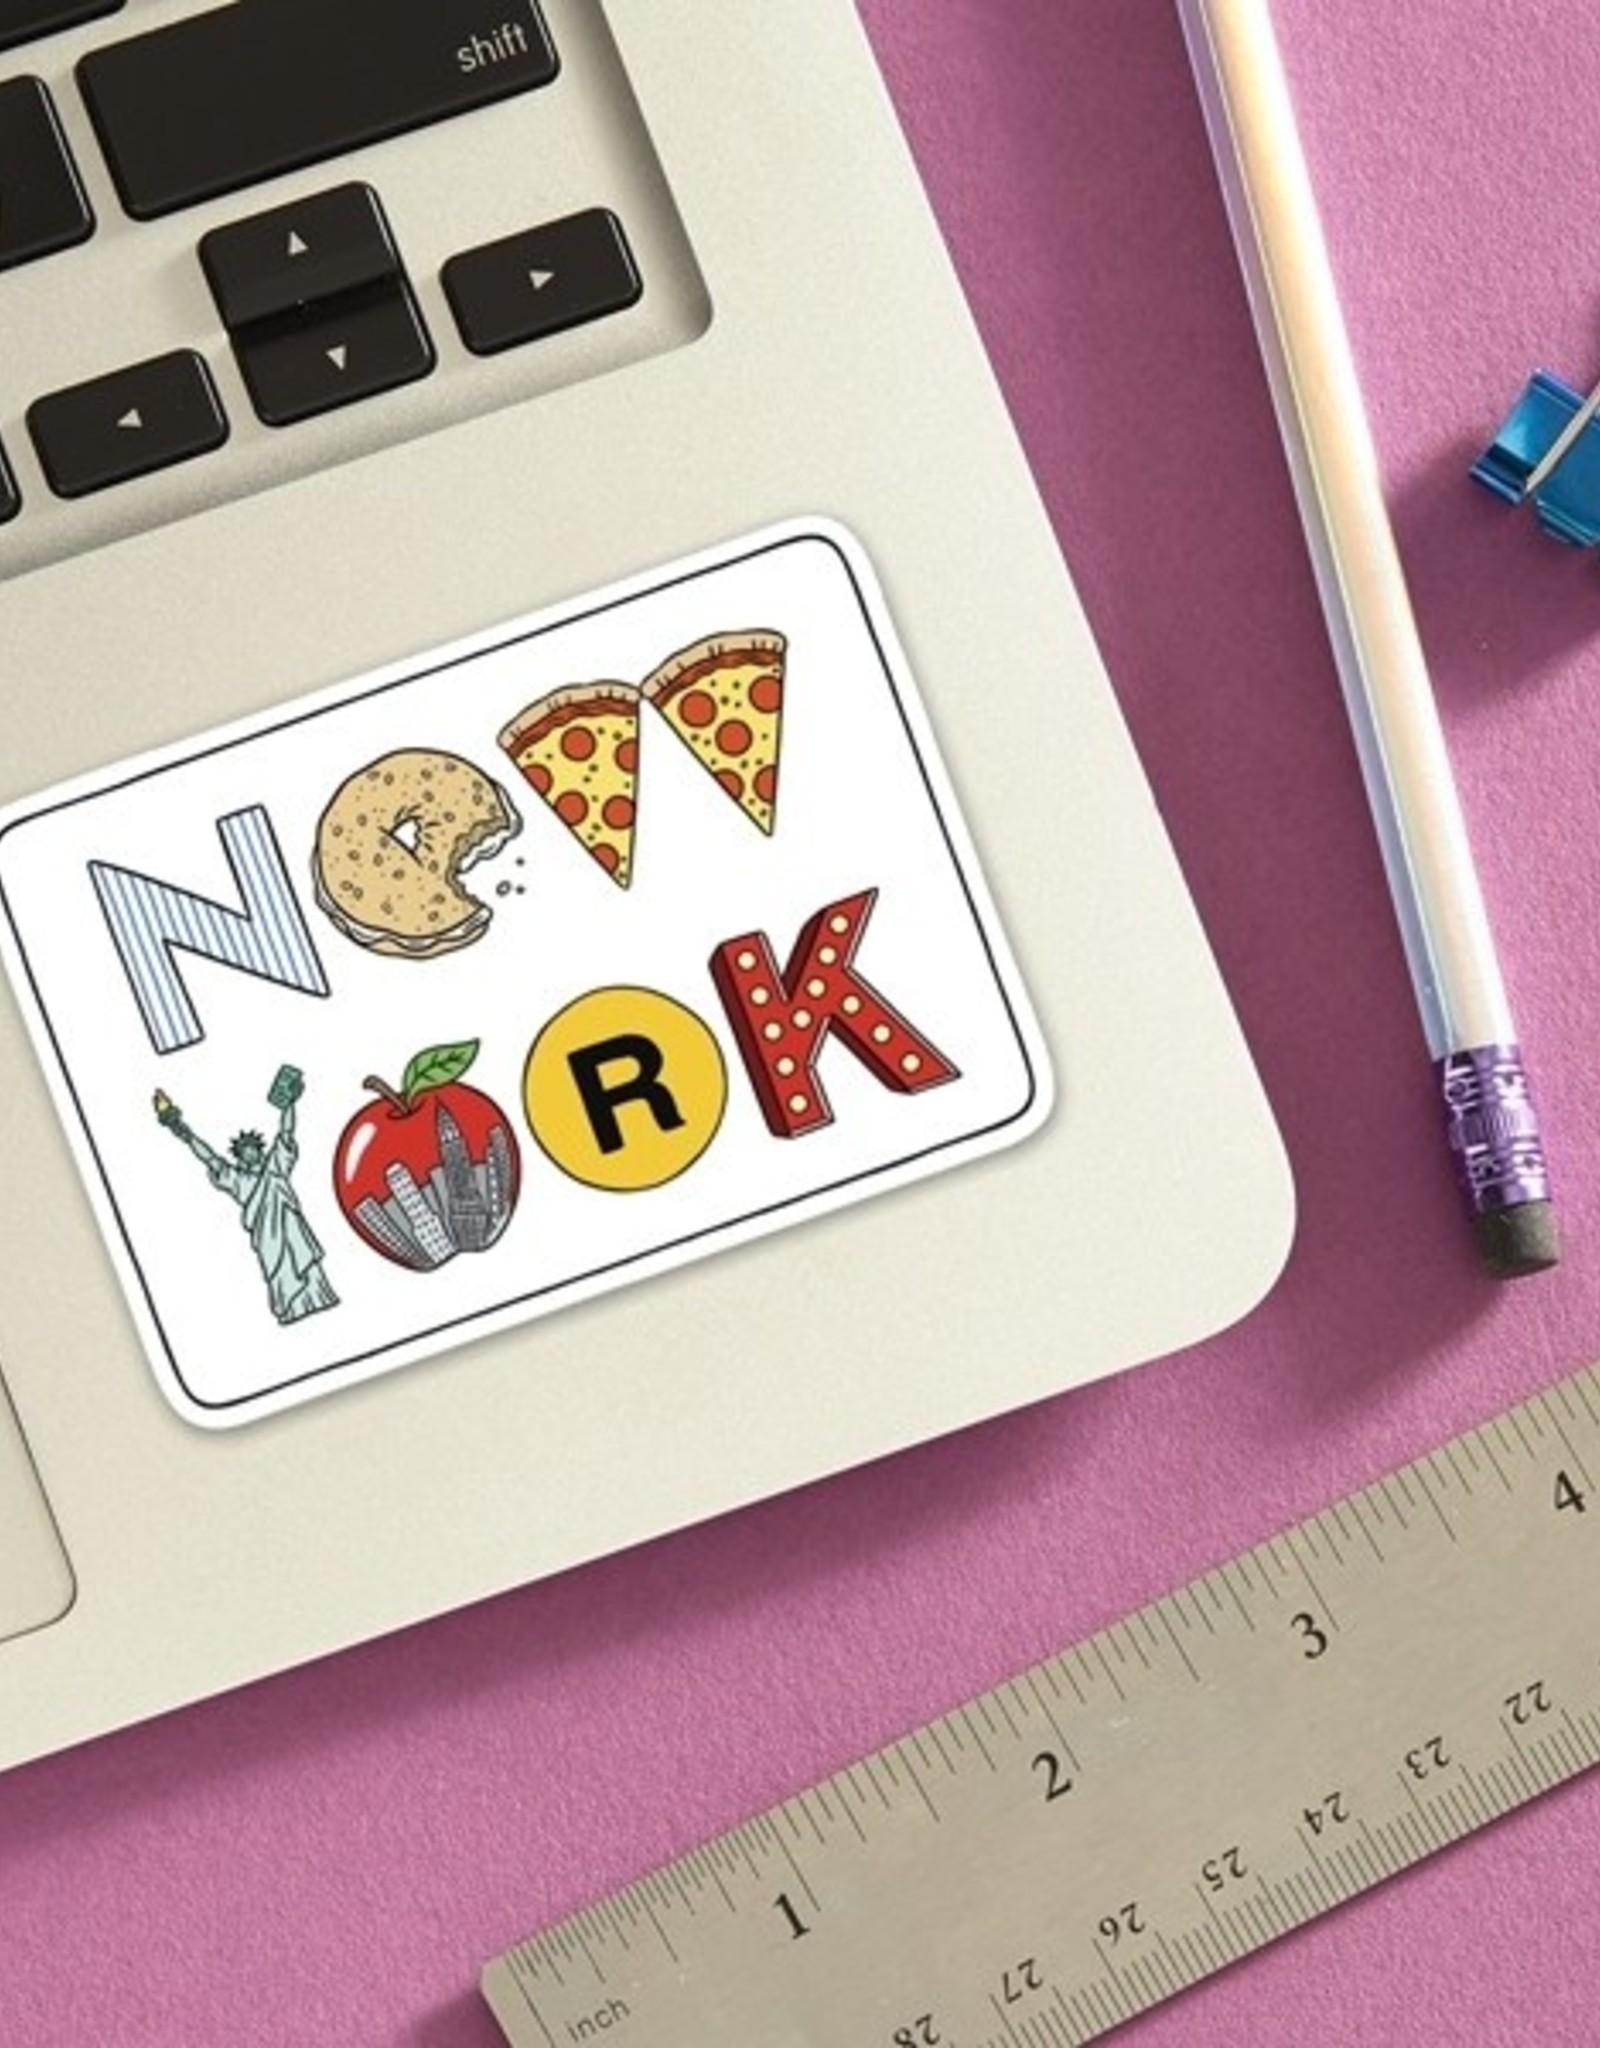 The Found Sticker - New York Icons